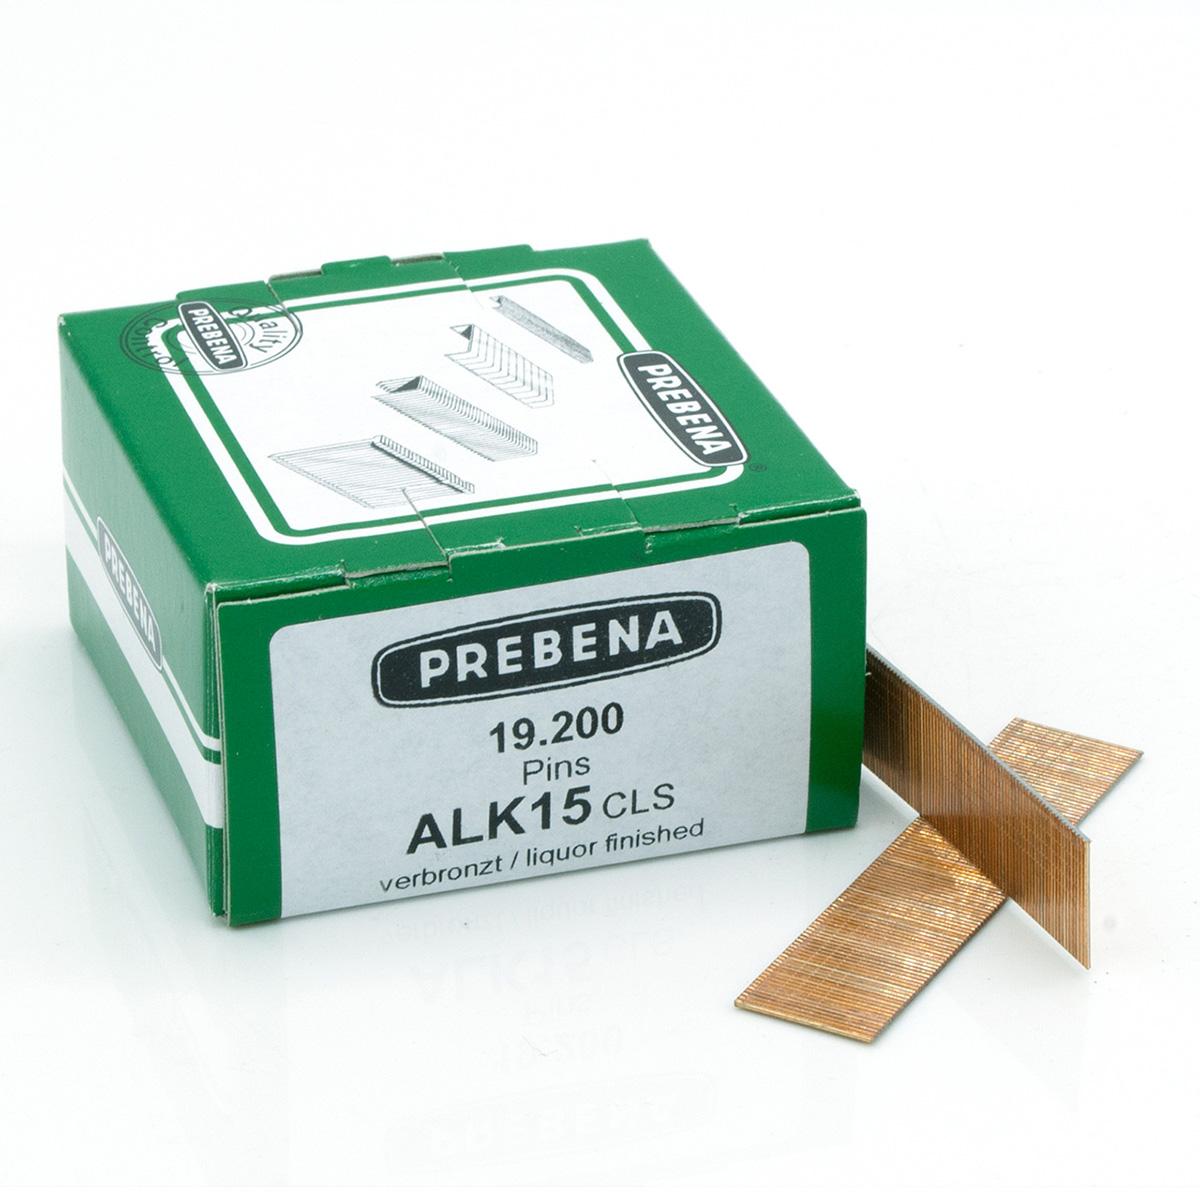 ALK15CLS Pins